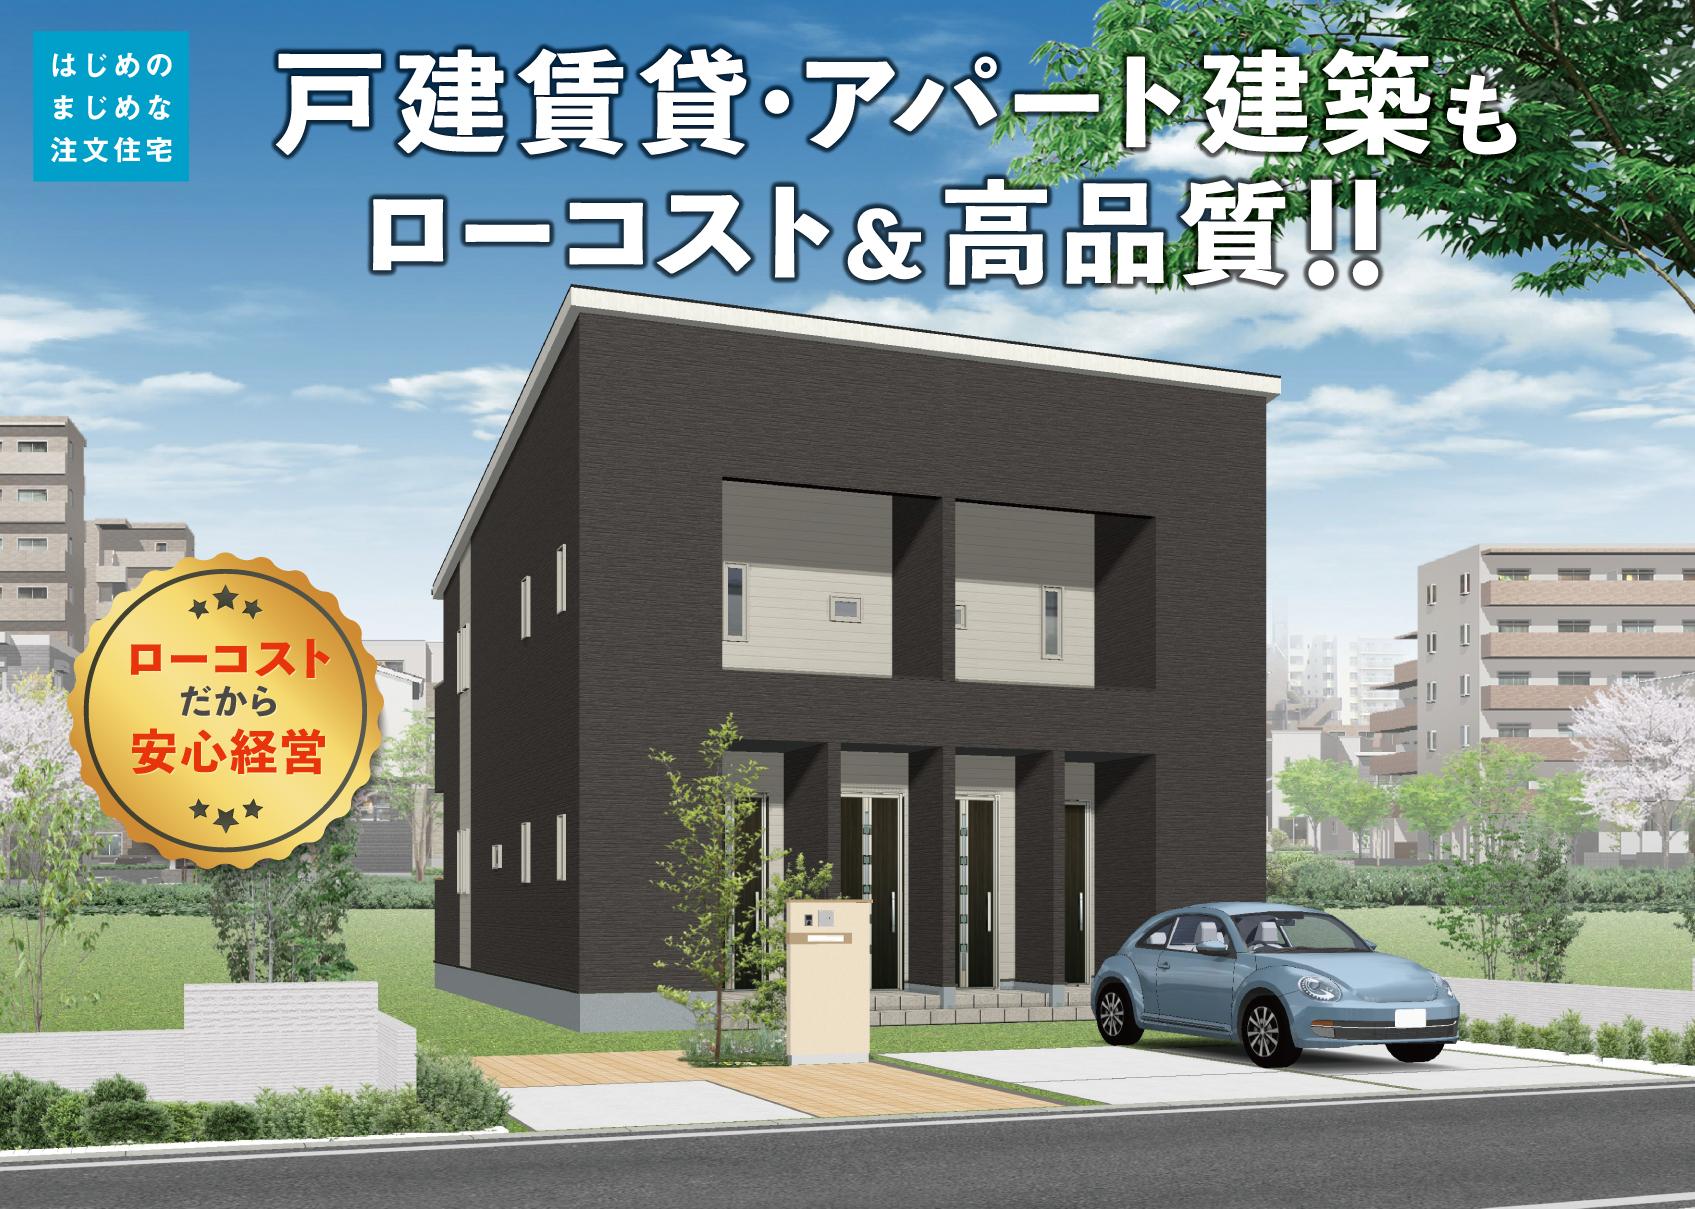 news_0805_b